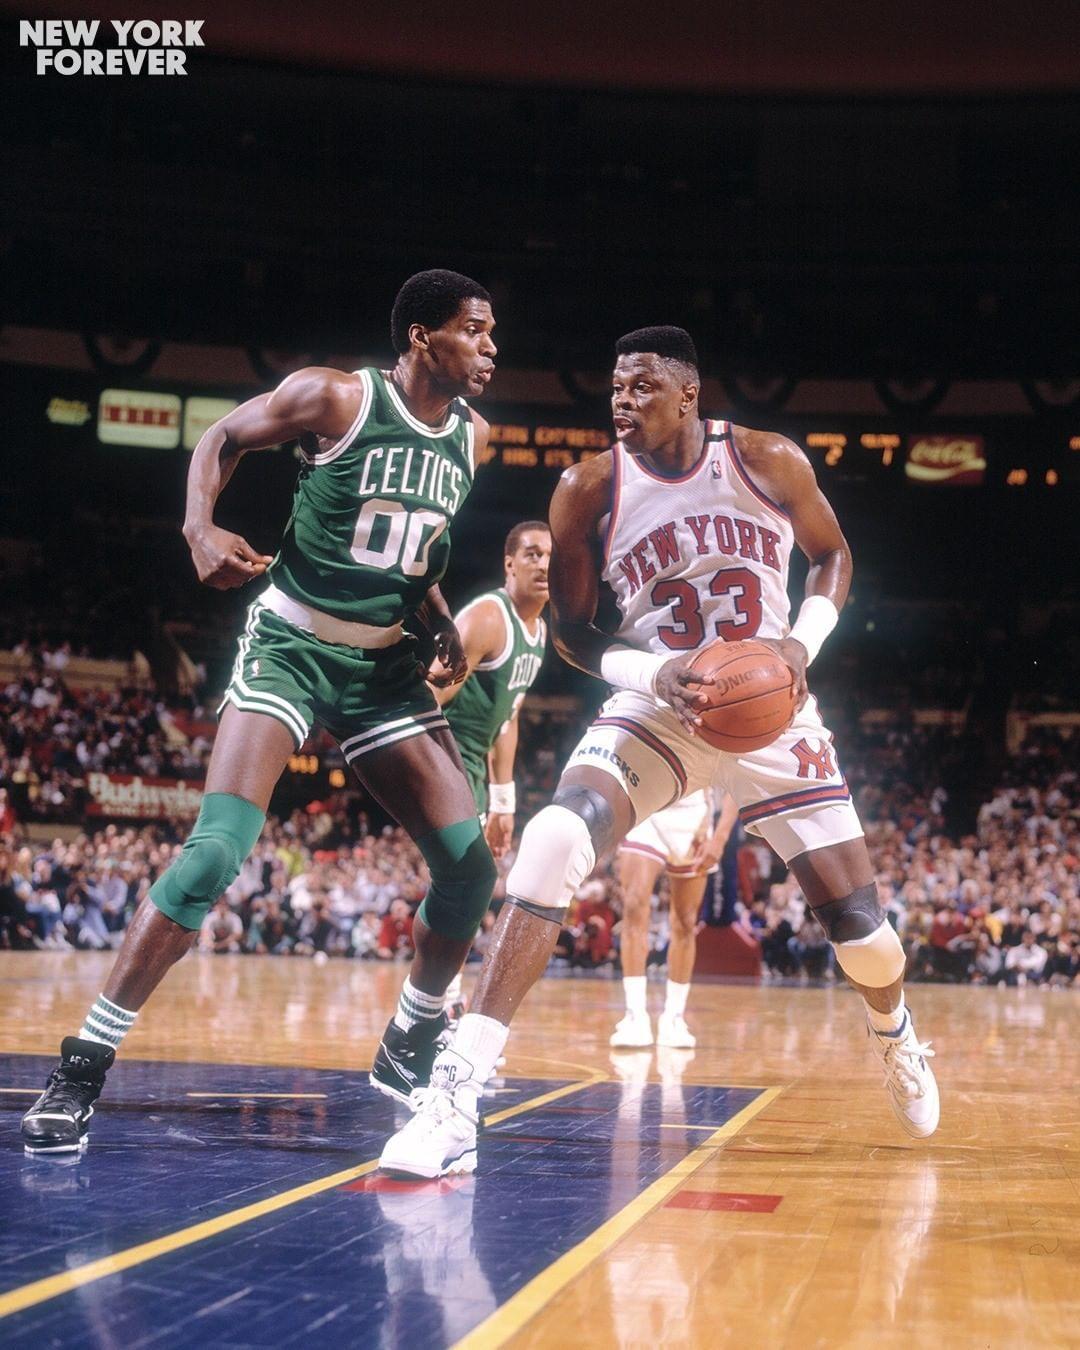 Pin on NBA New York Knicks